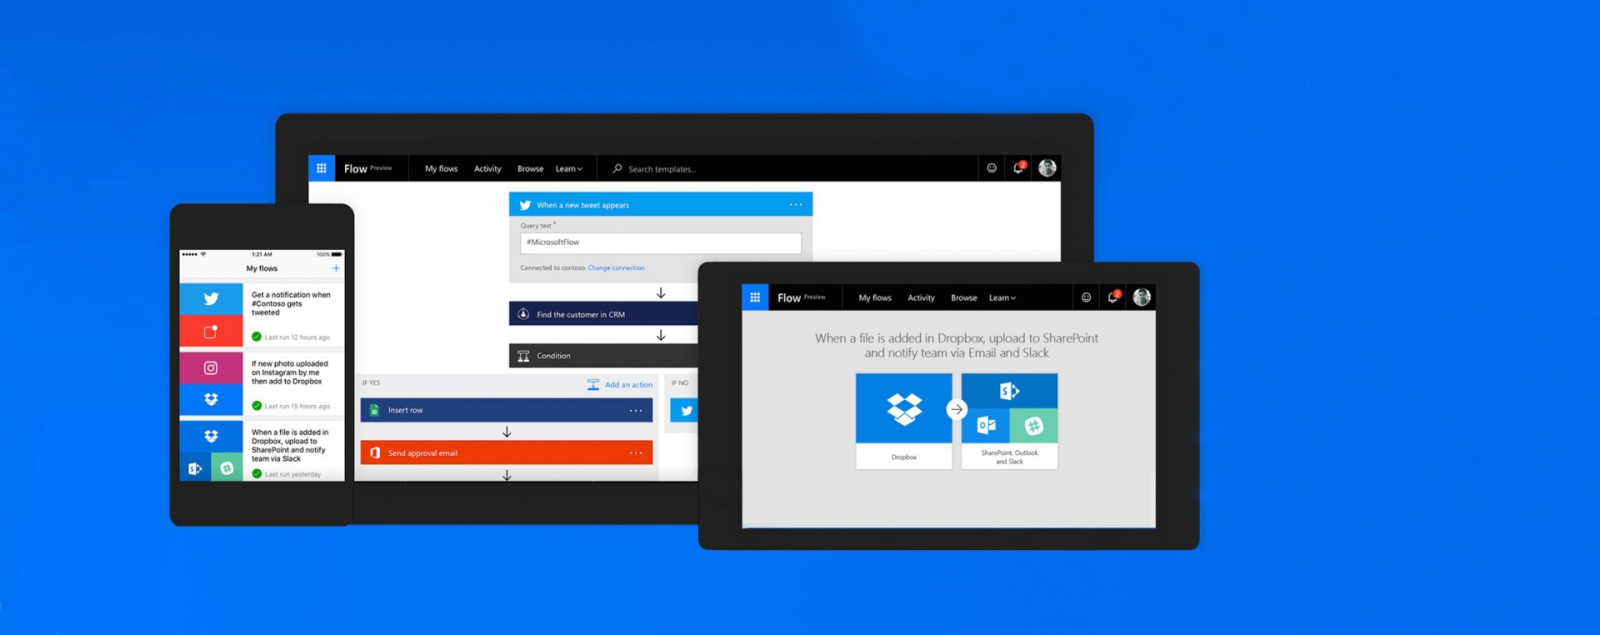 Microsoft Flow berganti menjadi Microsoft Power Automate